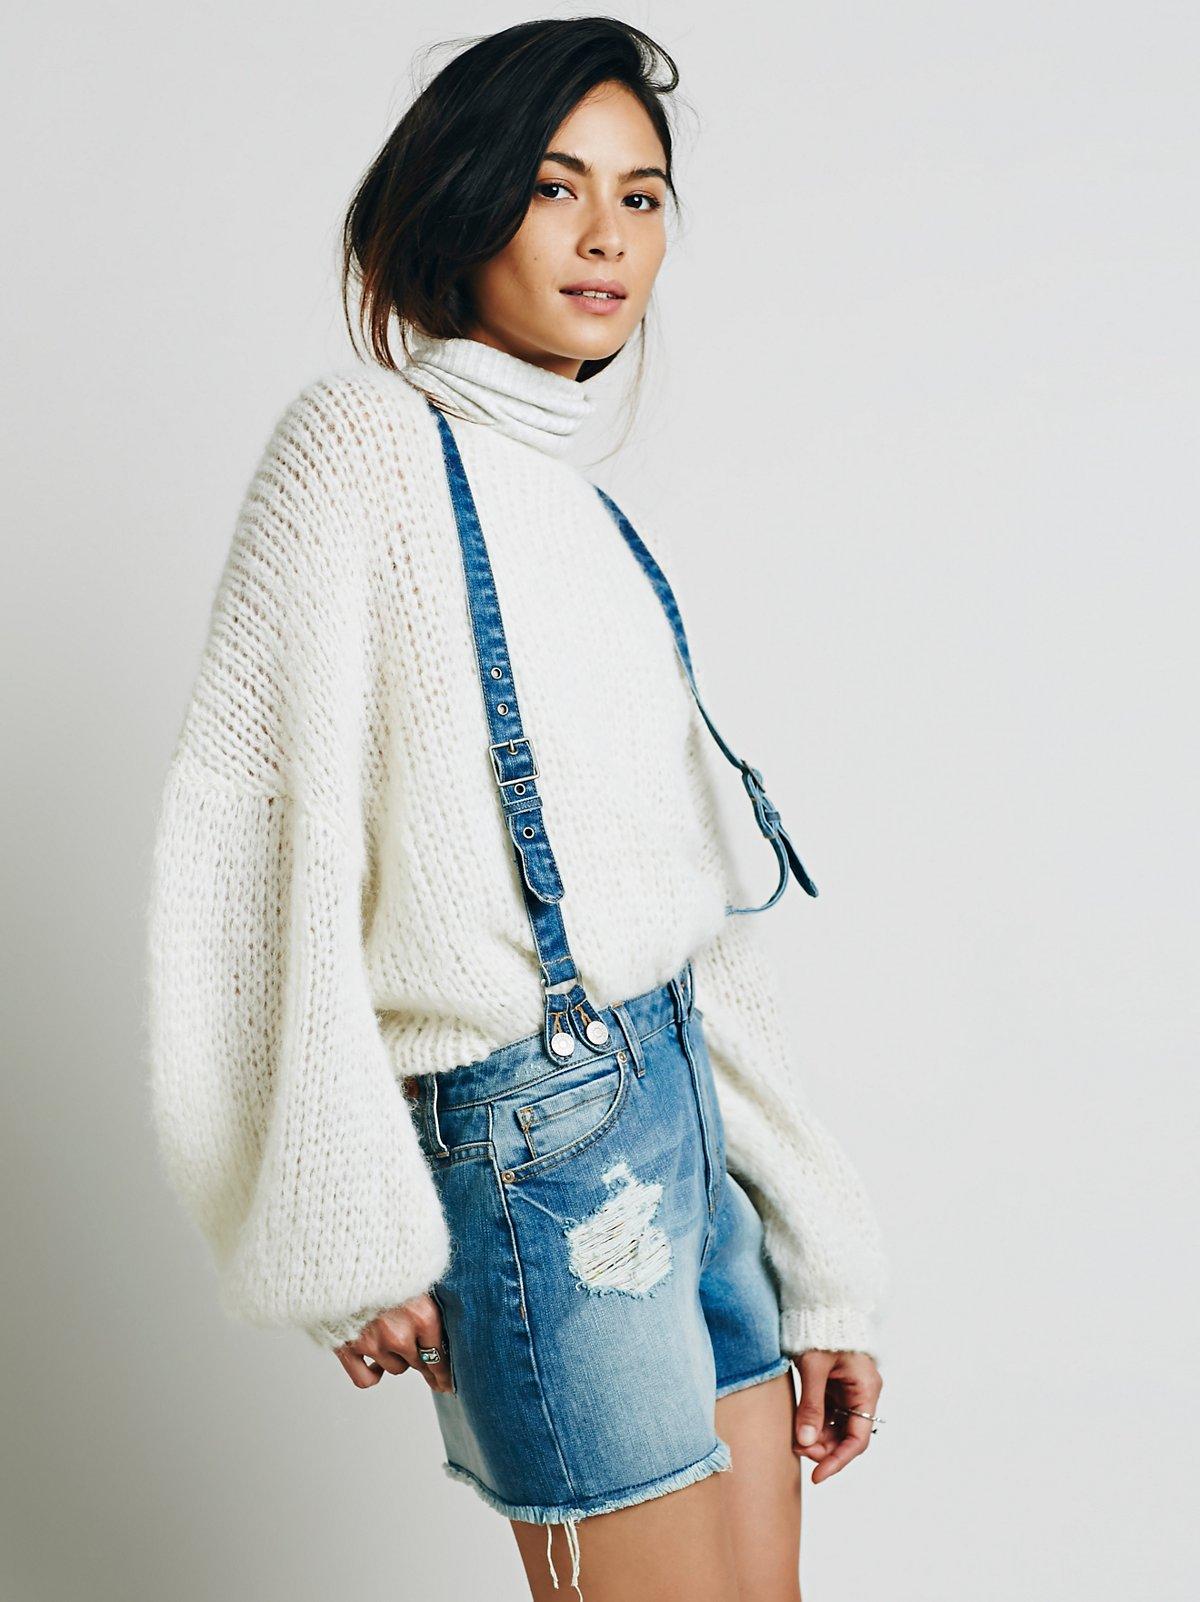 Clarissa Suspender短裤